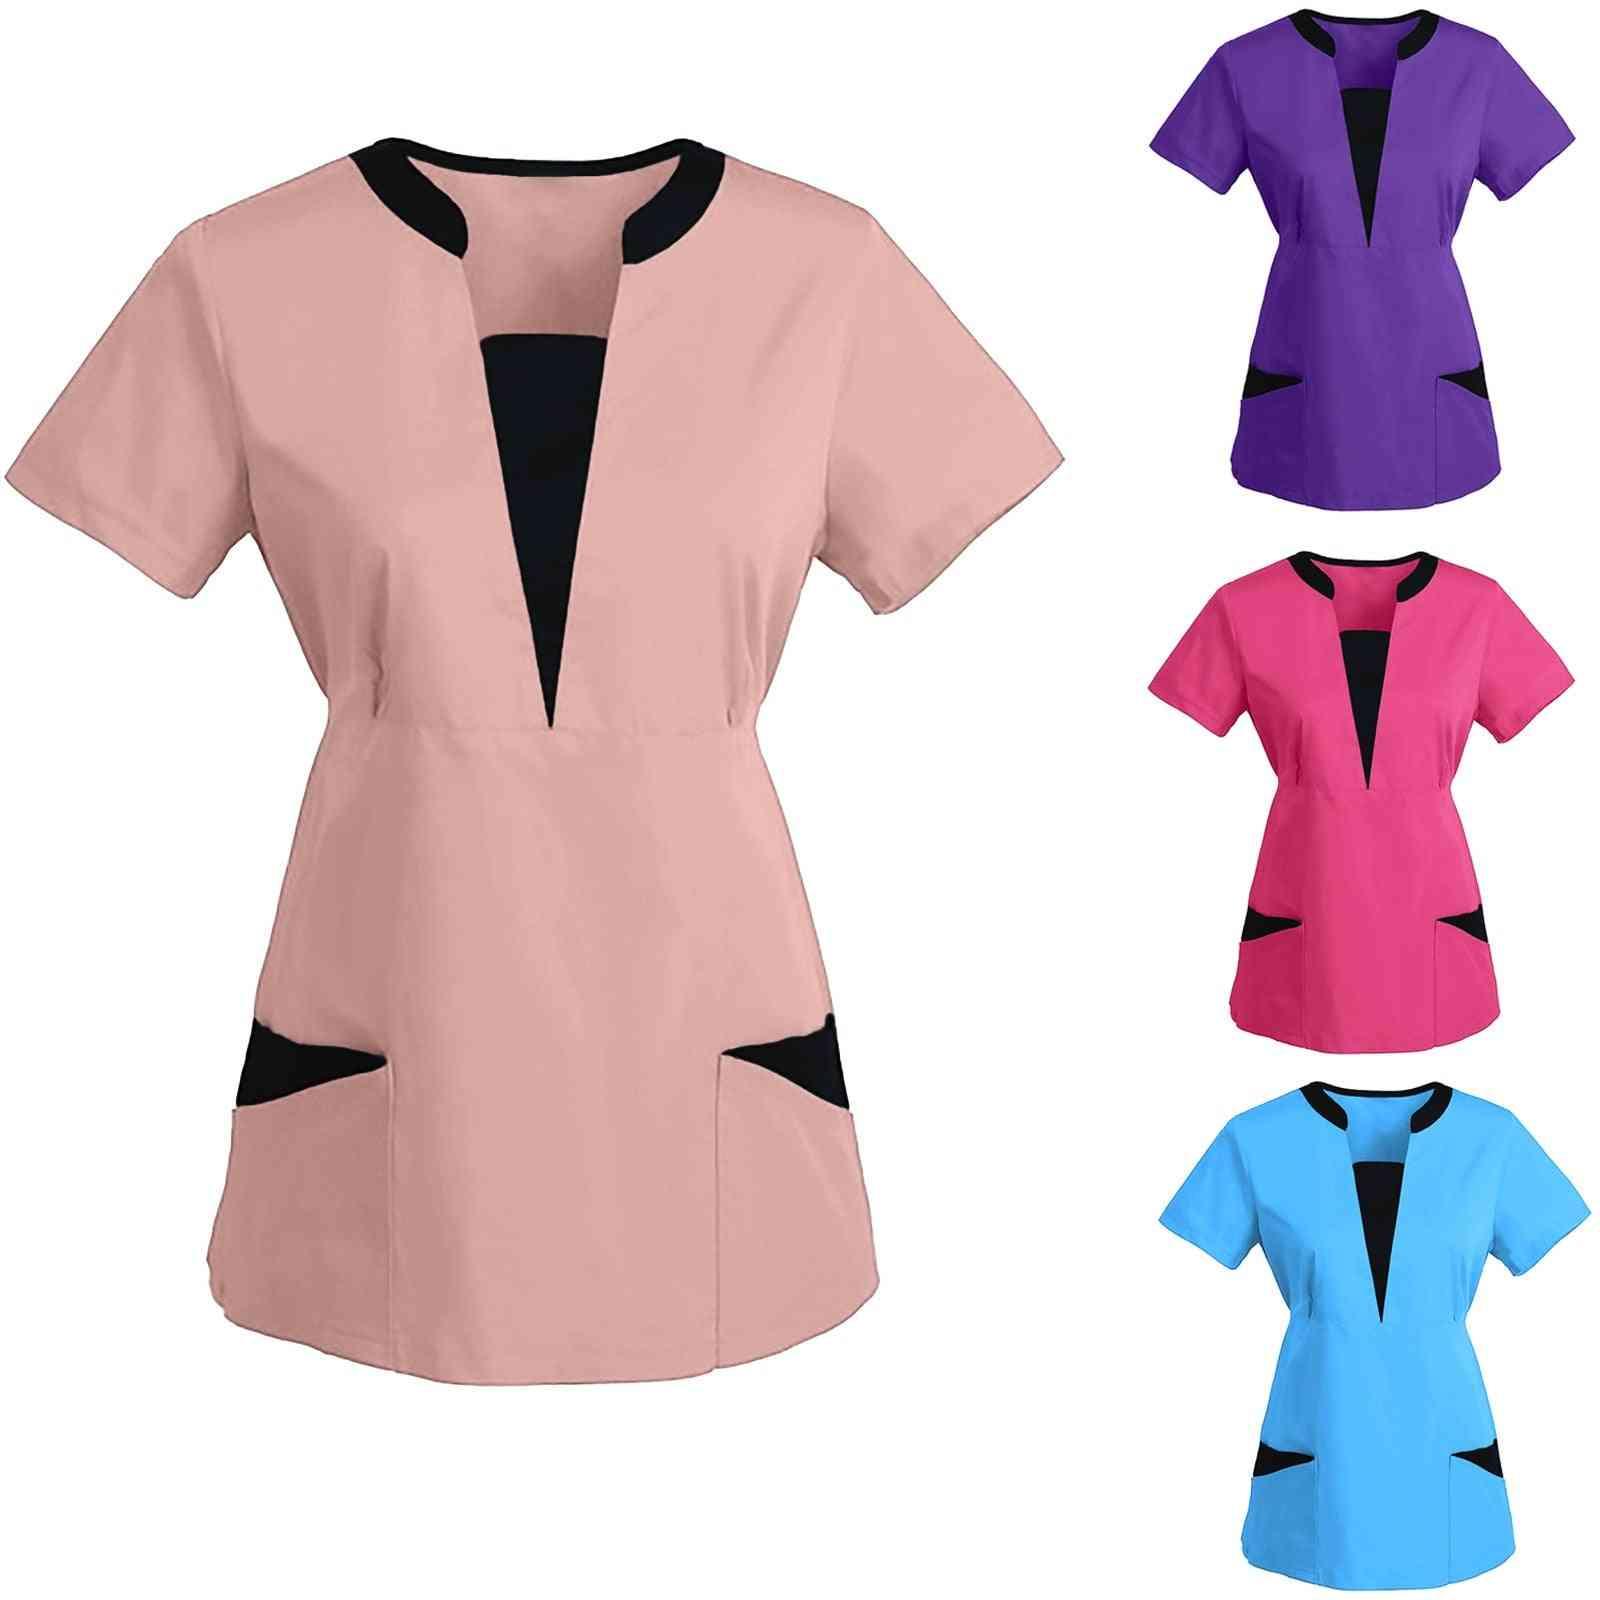 Work Wear Beauty Salon Spa Scrub Shirt Uniform